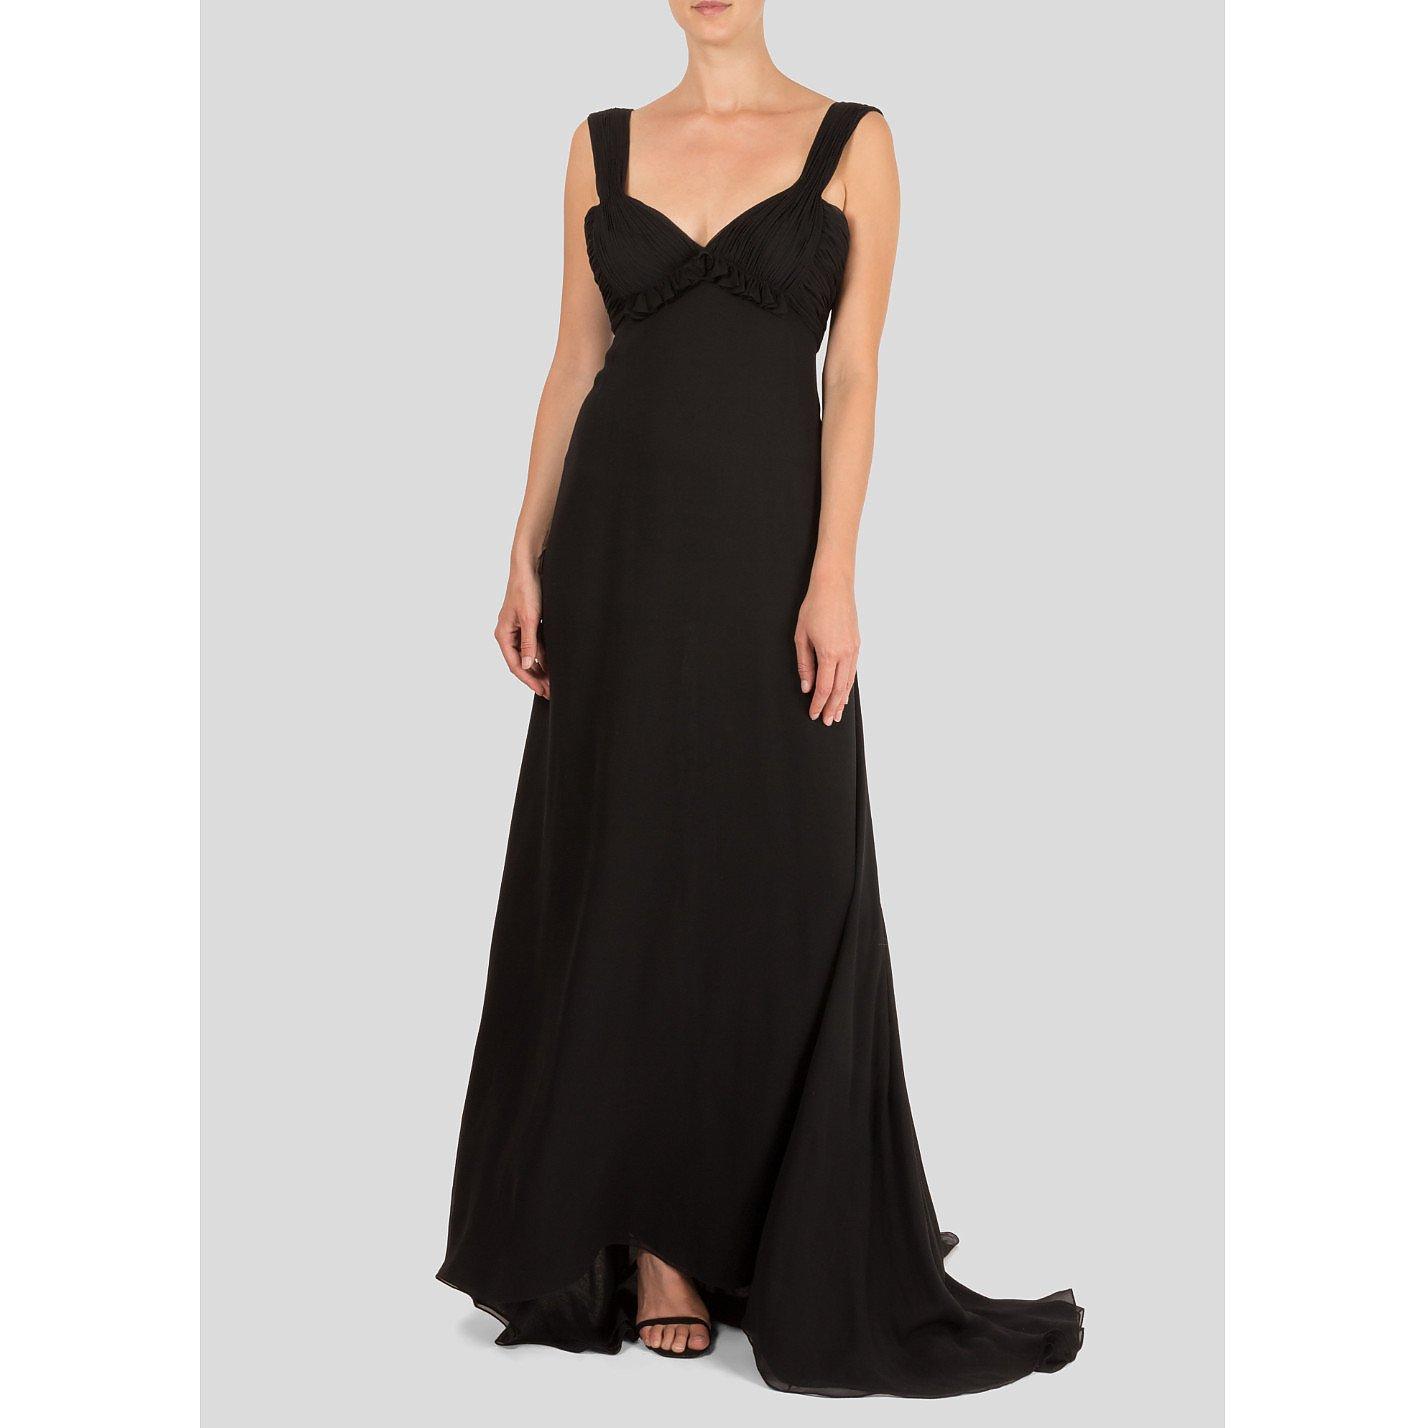 Oscar De La Renta Ruched Sleeveless Gown